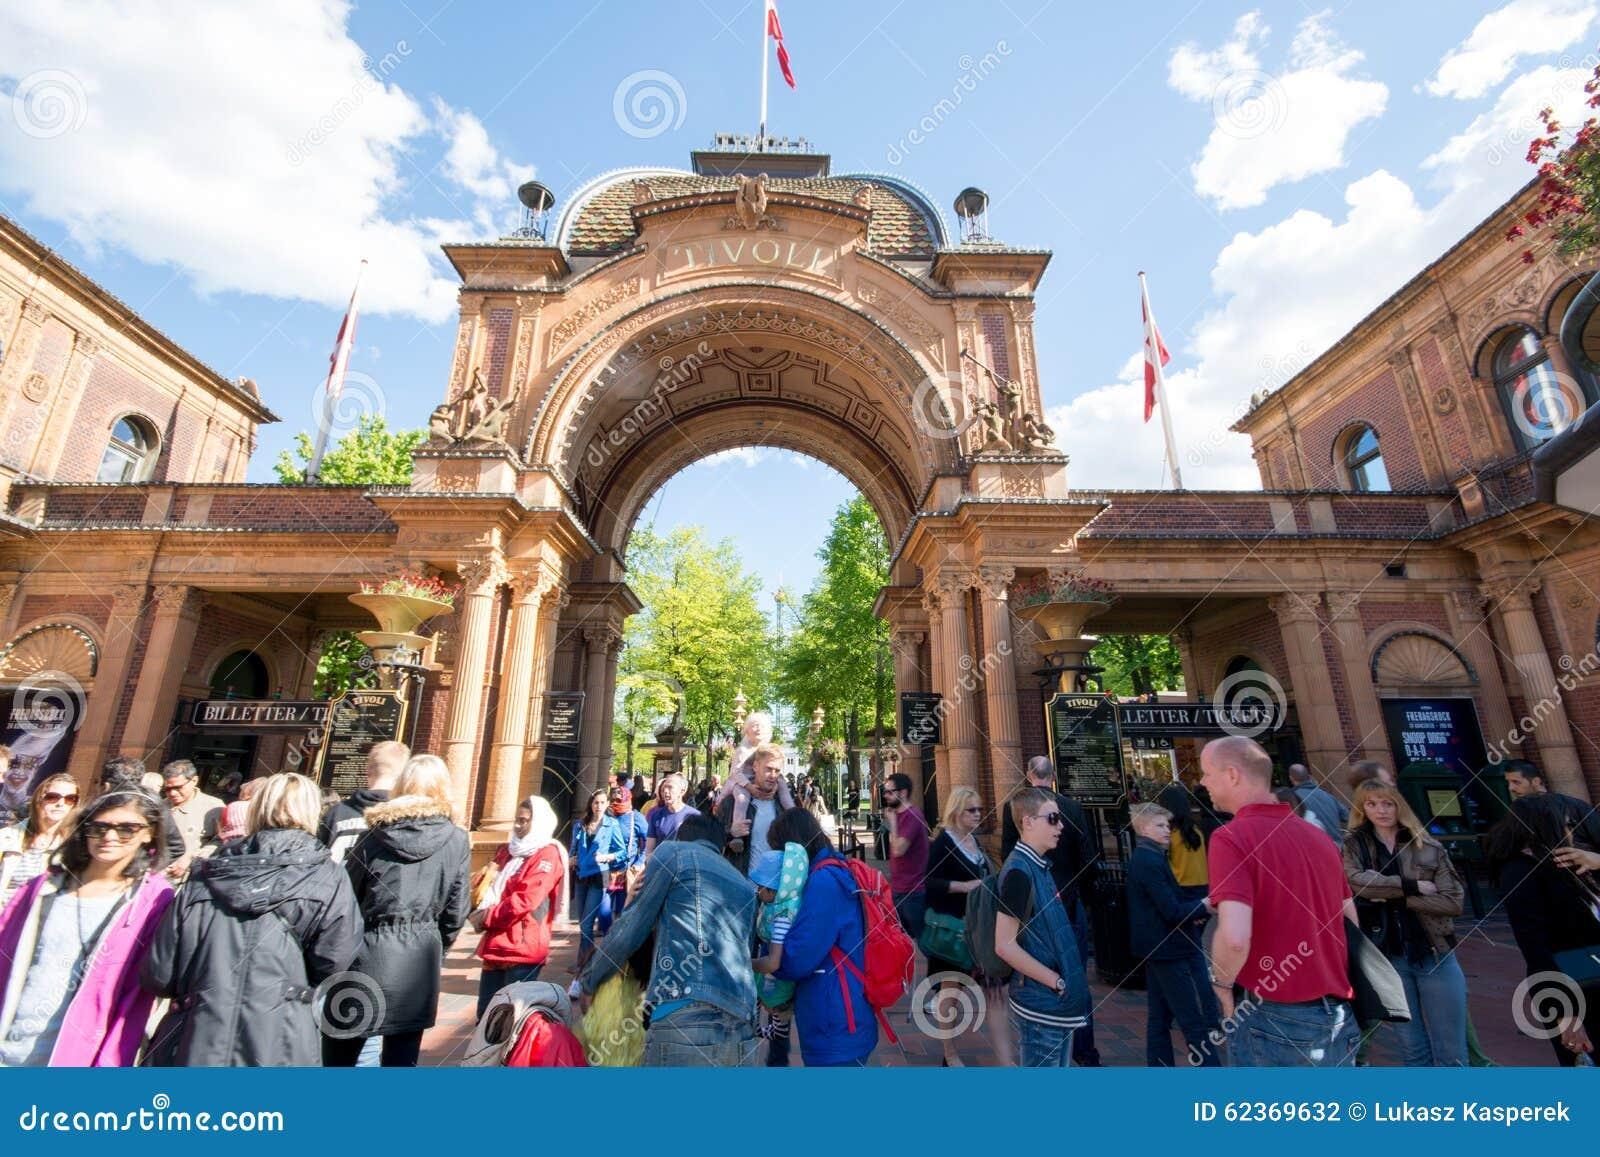 Copenaghen dæmonen montagne russe al parco divertimenti giardini